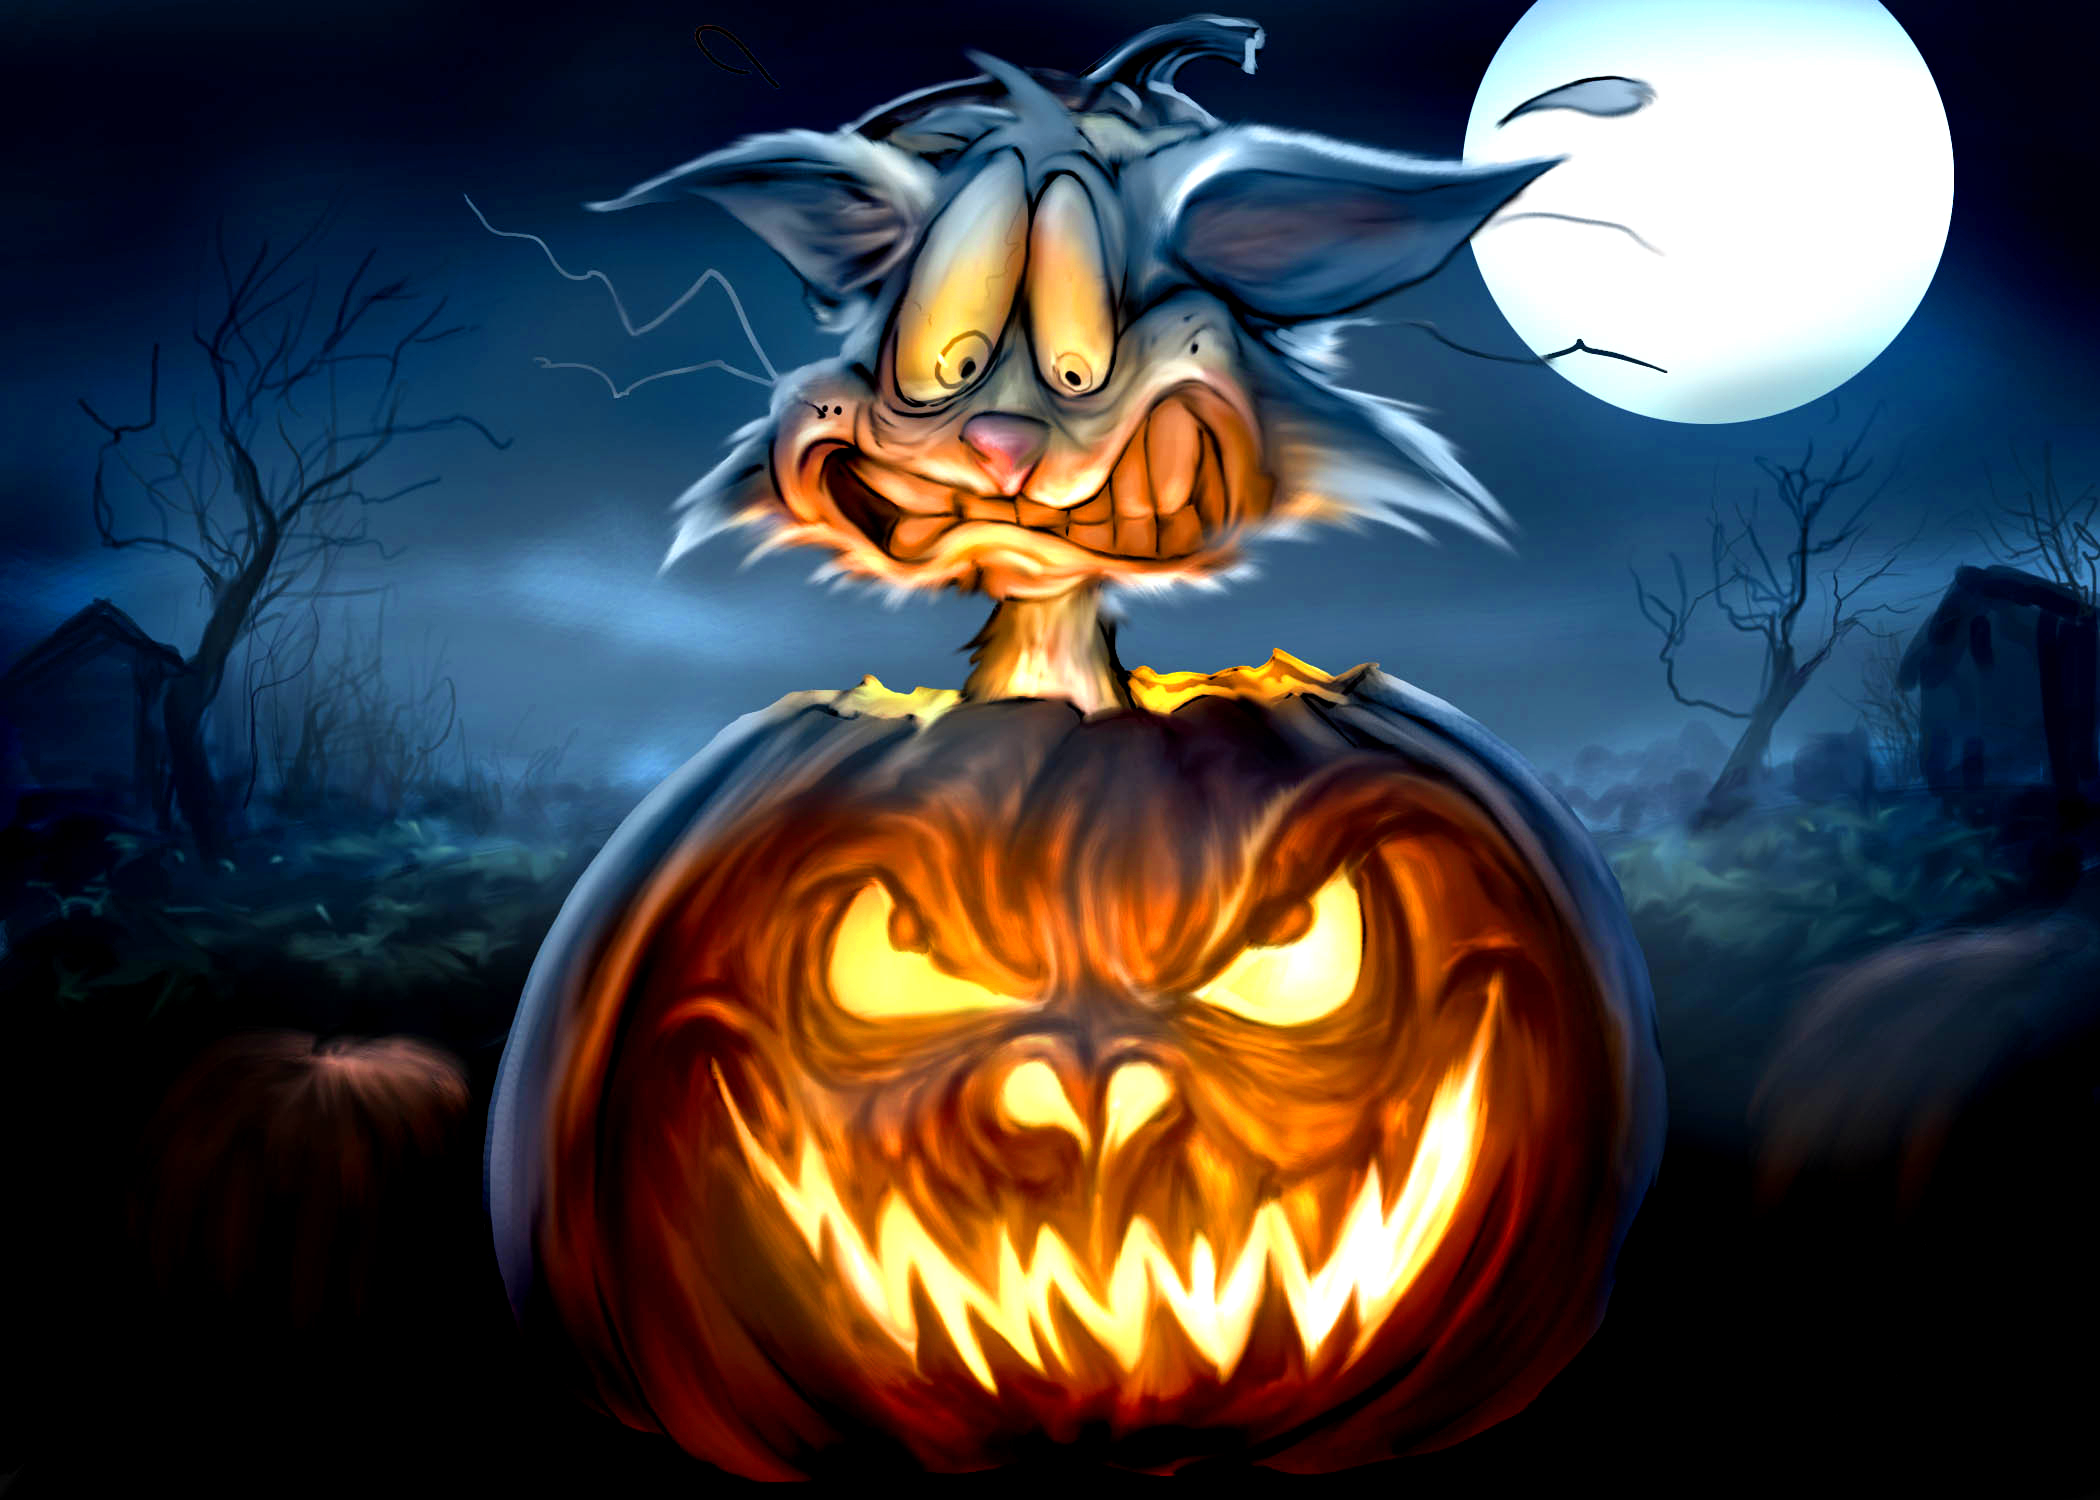 happy halloween from scott rene